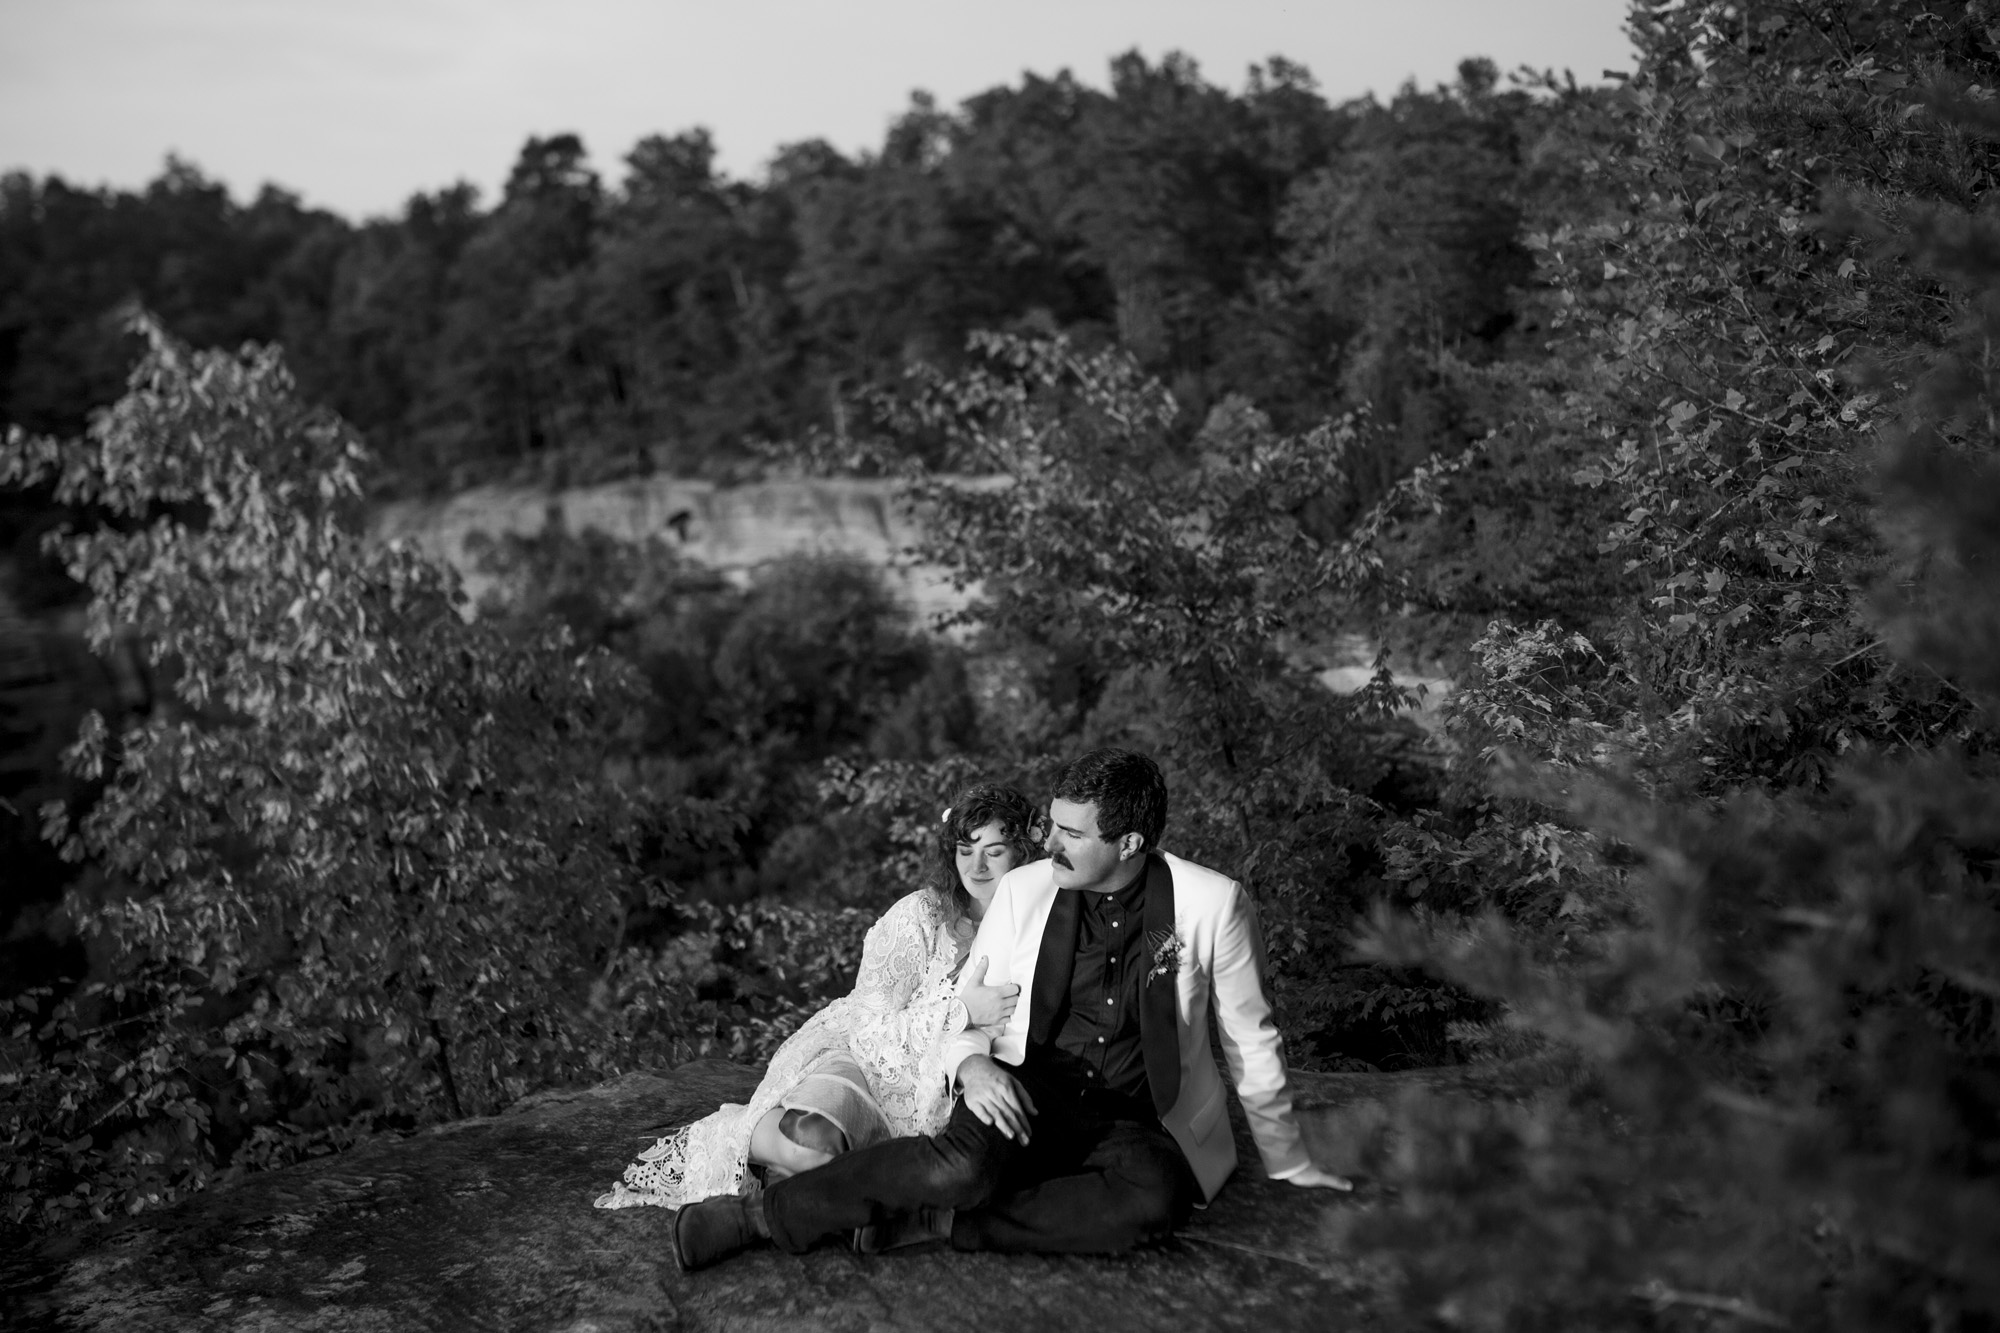 Seriously_Sabrina_Photography_Red_River_Gorge_Kentucky_Wedding_ShawnDana162.jpg